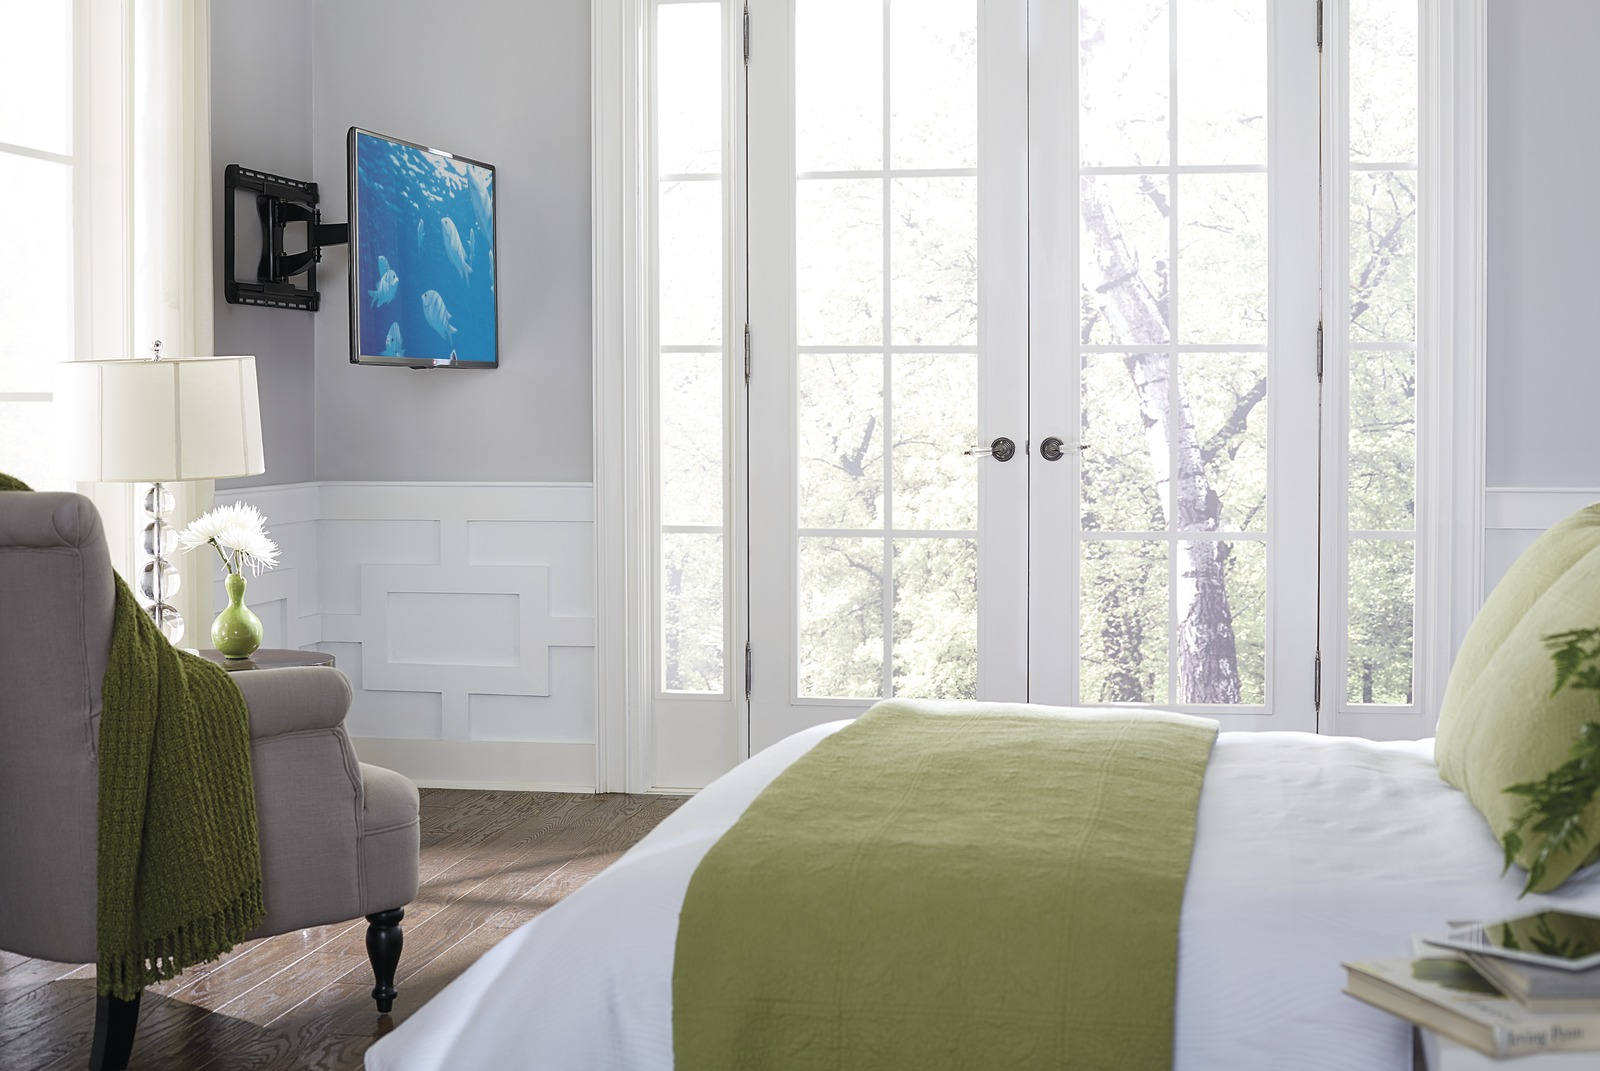 TV mounted in corner of bedroom